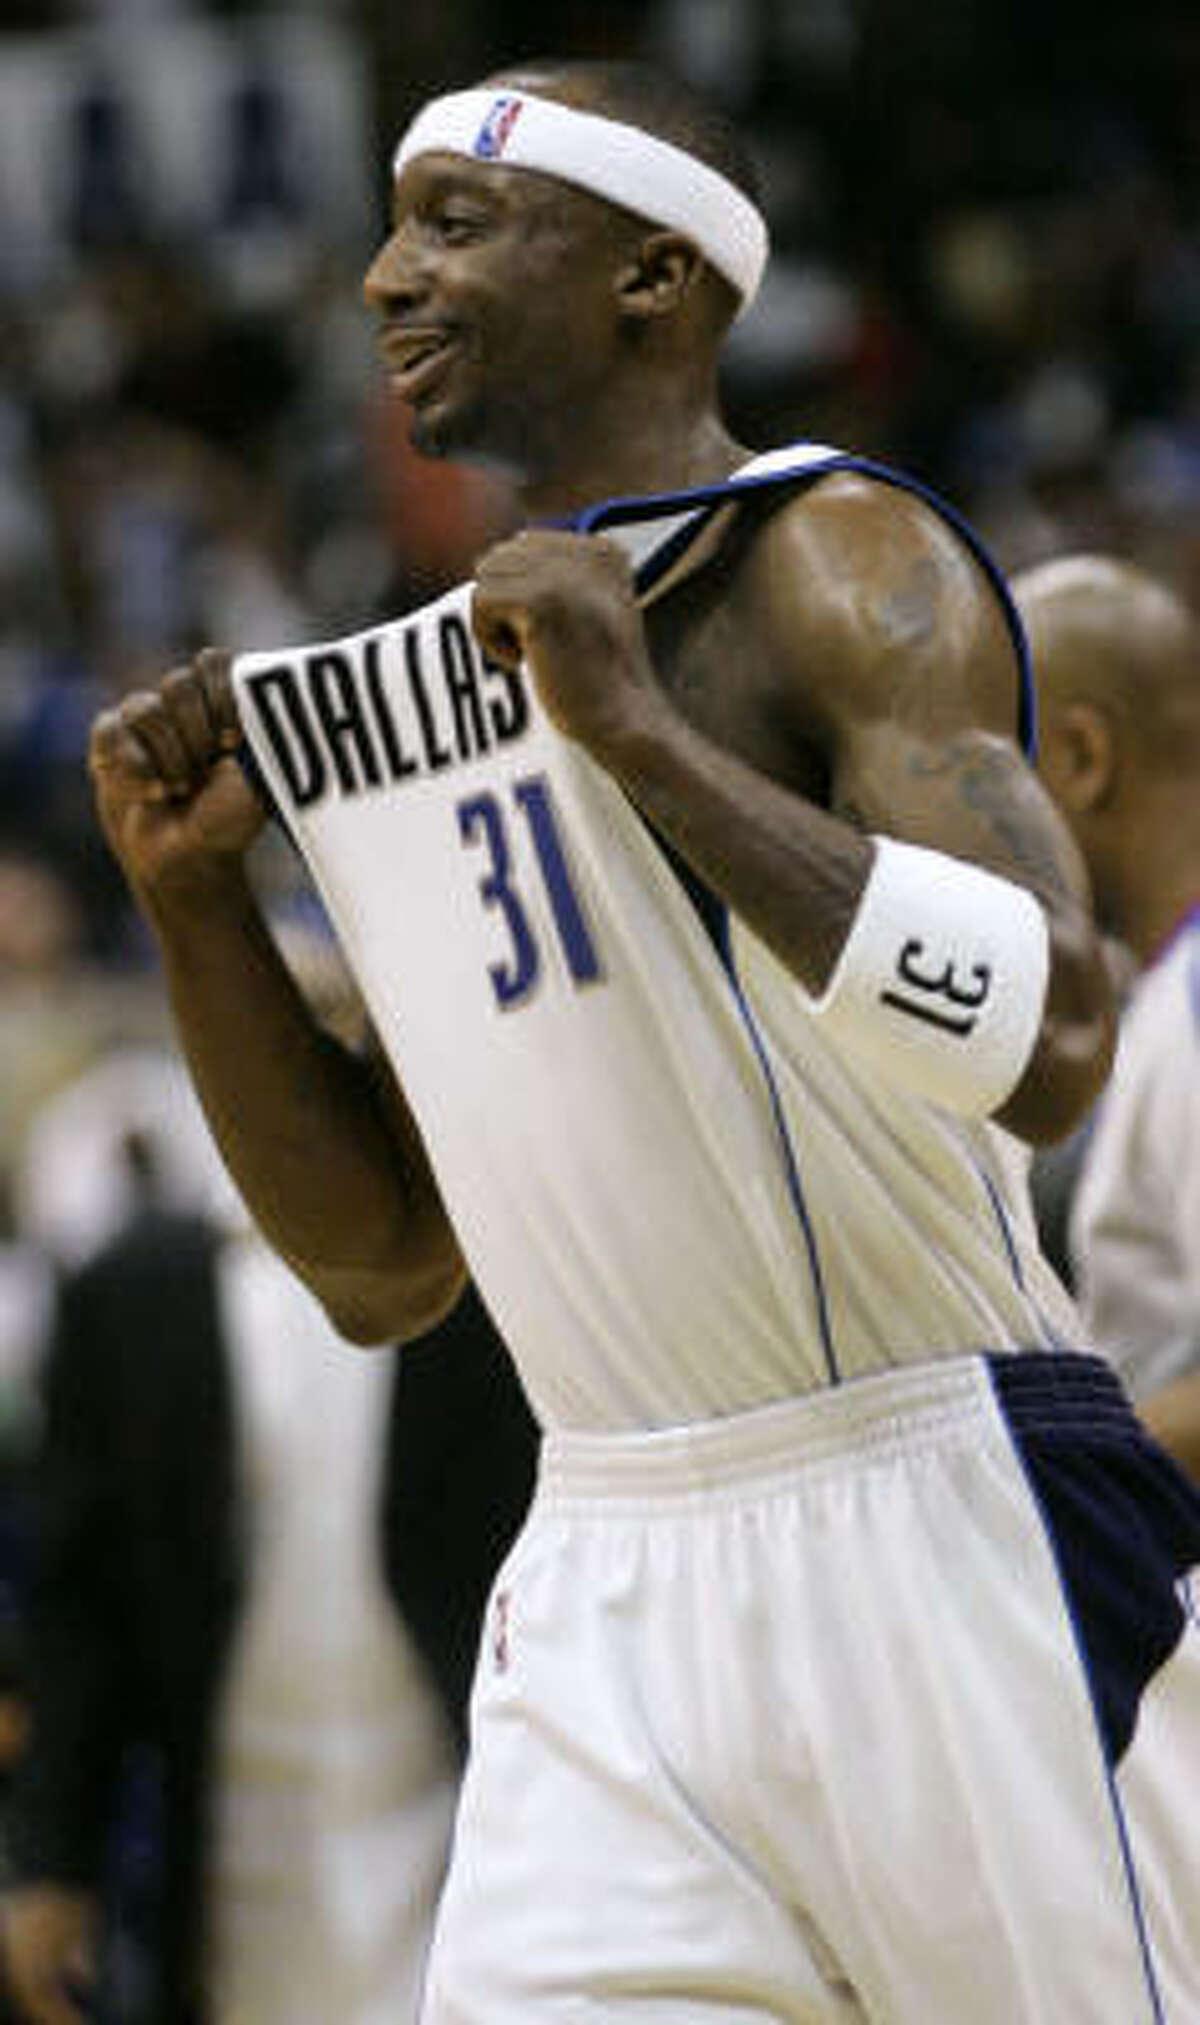 Dallas Mavericks guard Jason Terry celebrates at the end of the Mavericks' win over the Rockets.